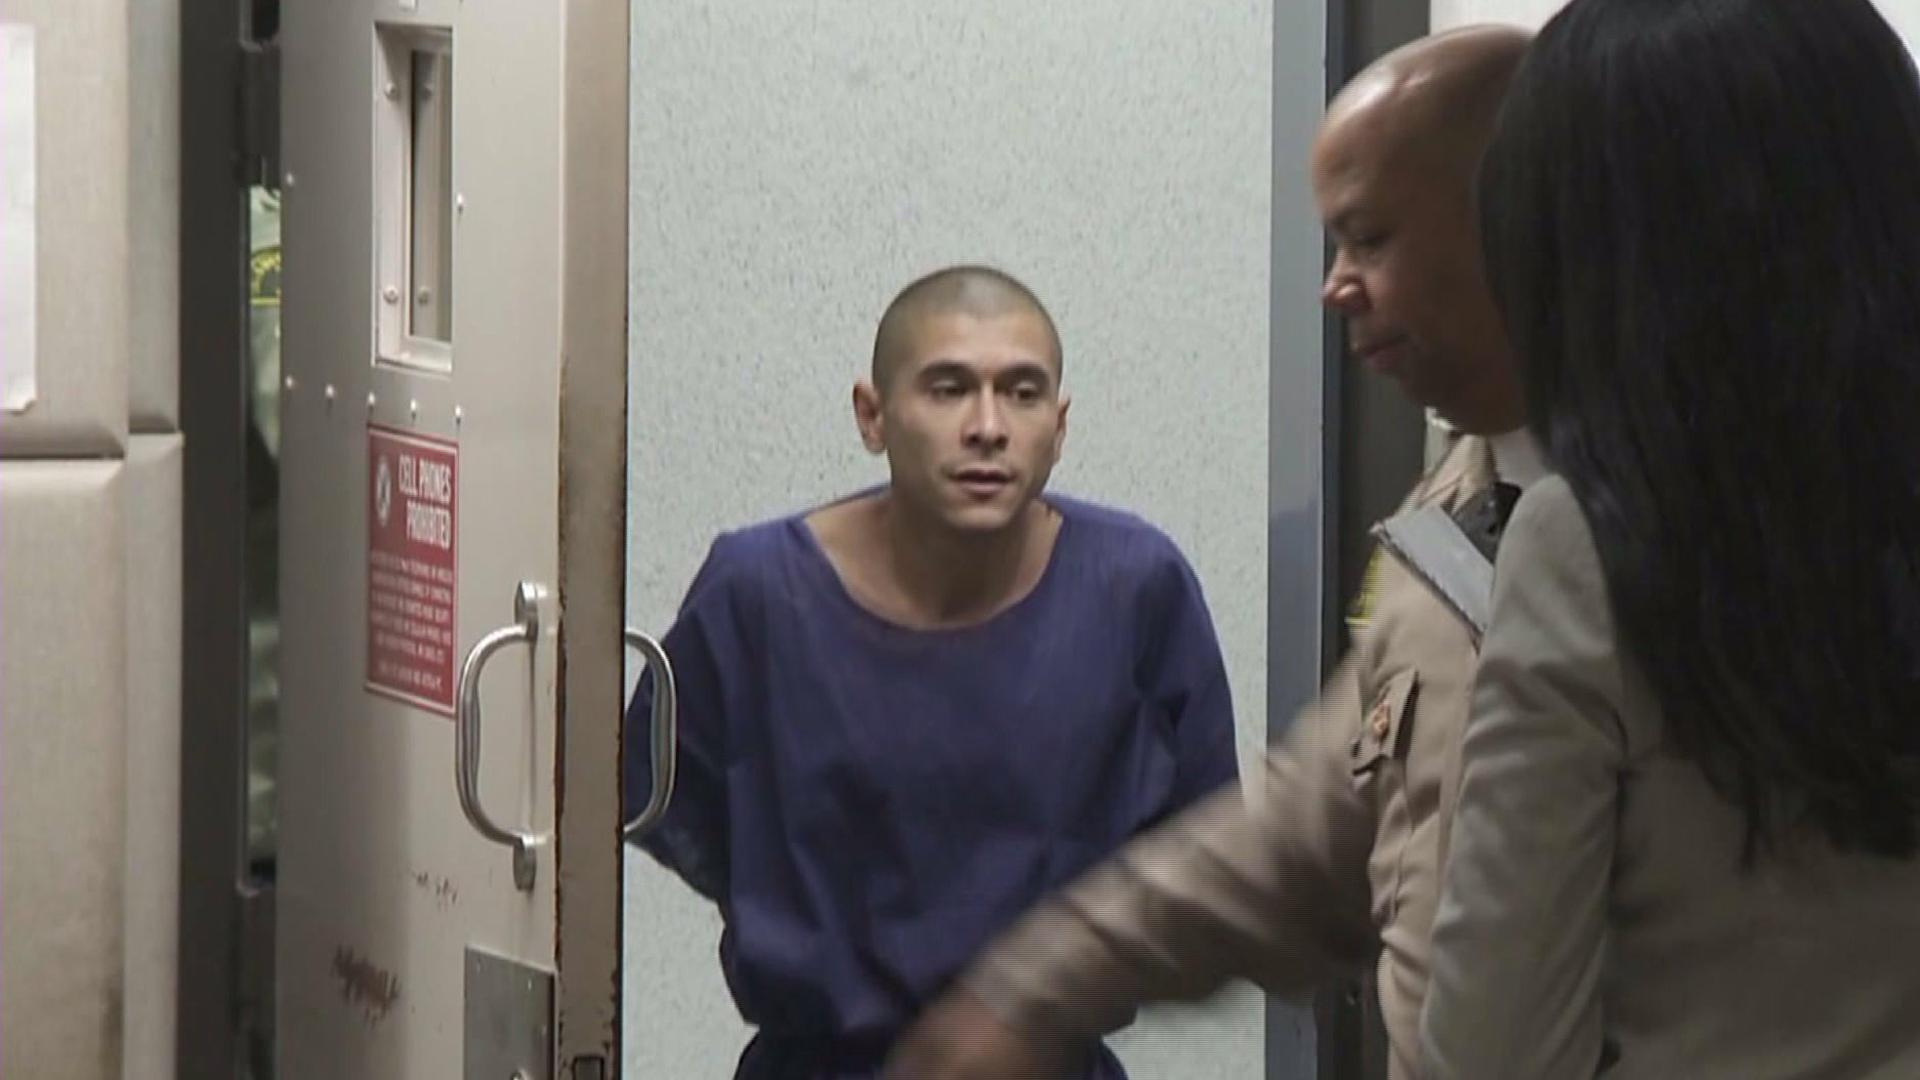 Samuel Robert Duran Jr. walks into Airport Courthouse for his arraignment on April 16, 2015. (Credit: KTLA)